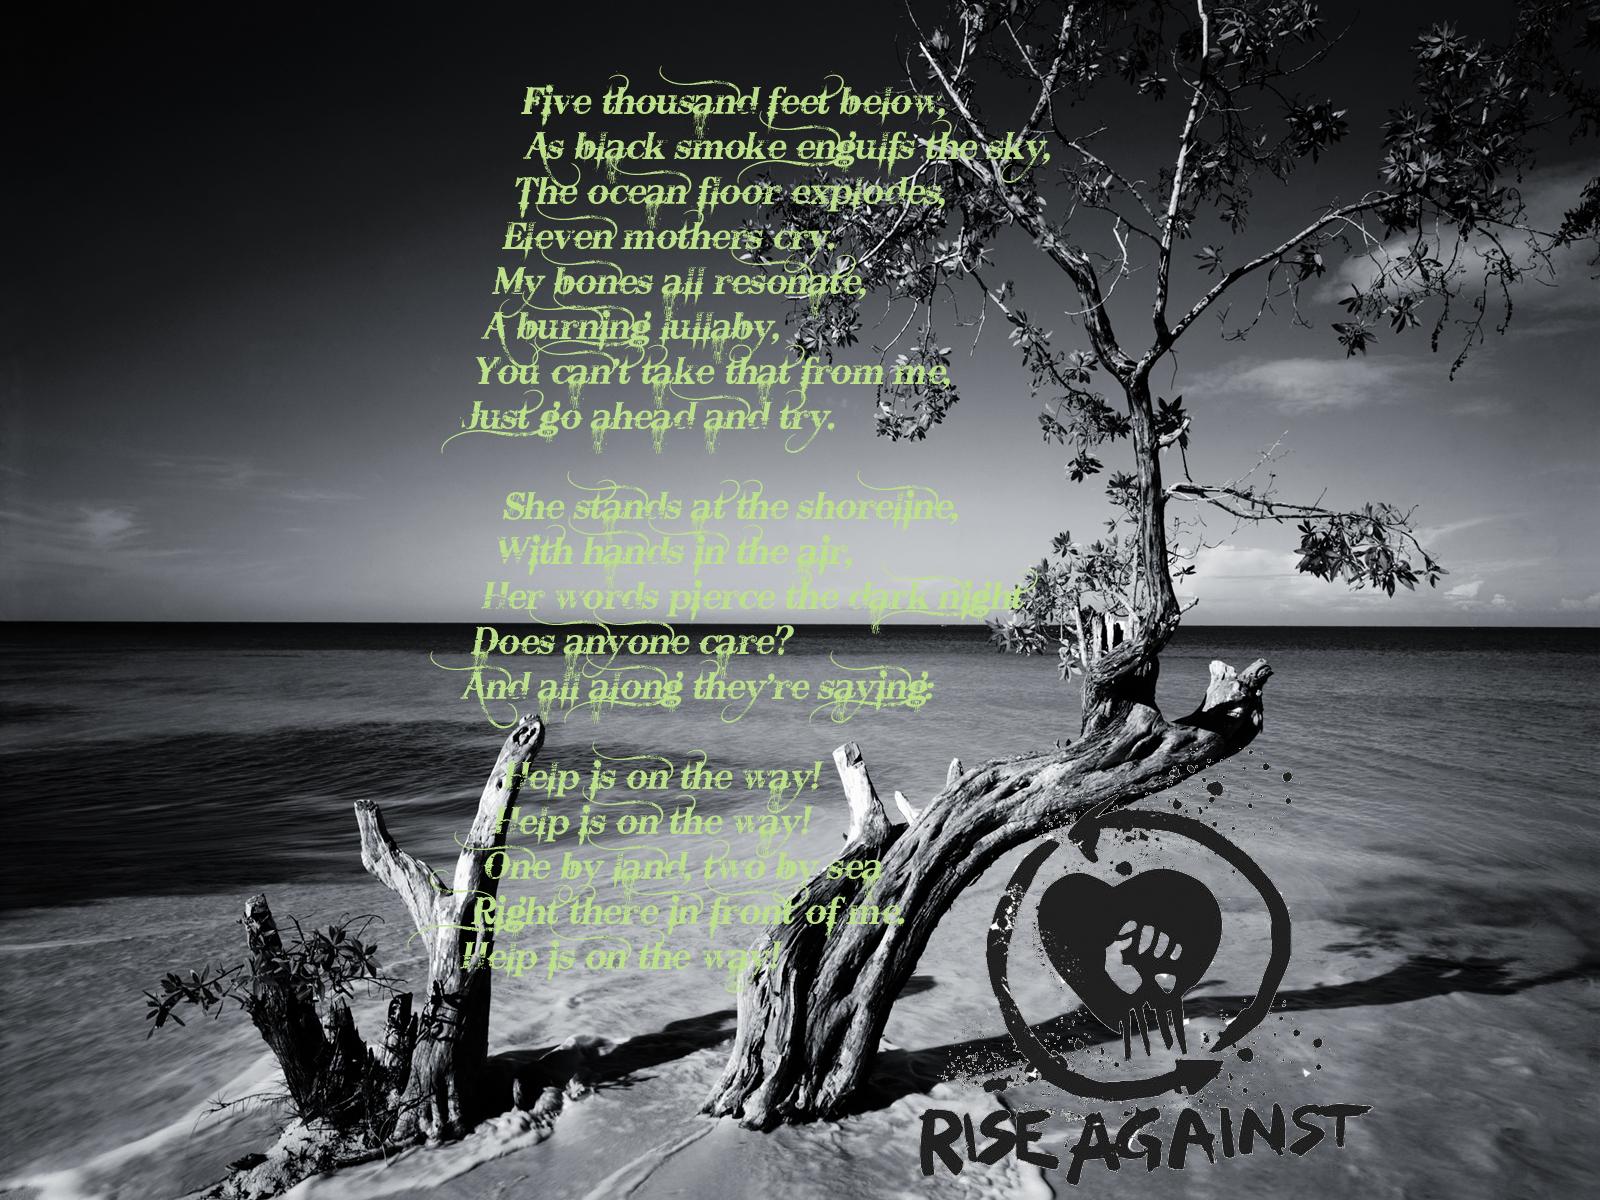 1600x1200 Px Hardcore Lyrics Monochrome Punk Rock Rise Against